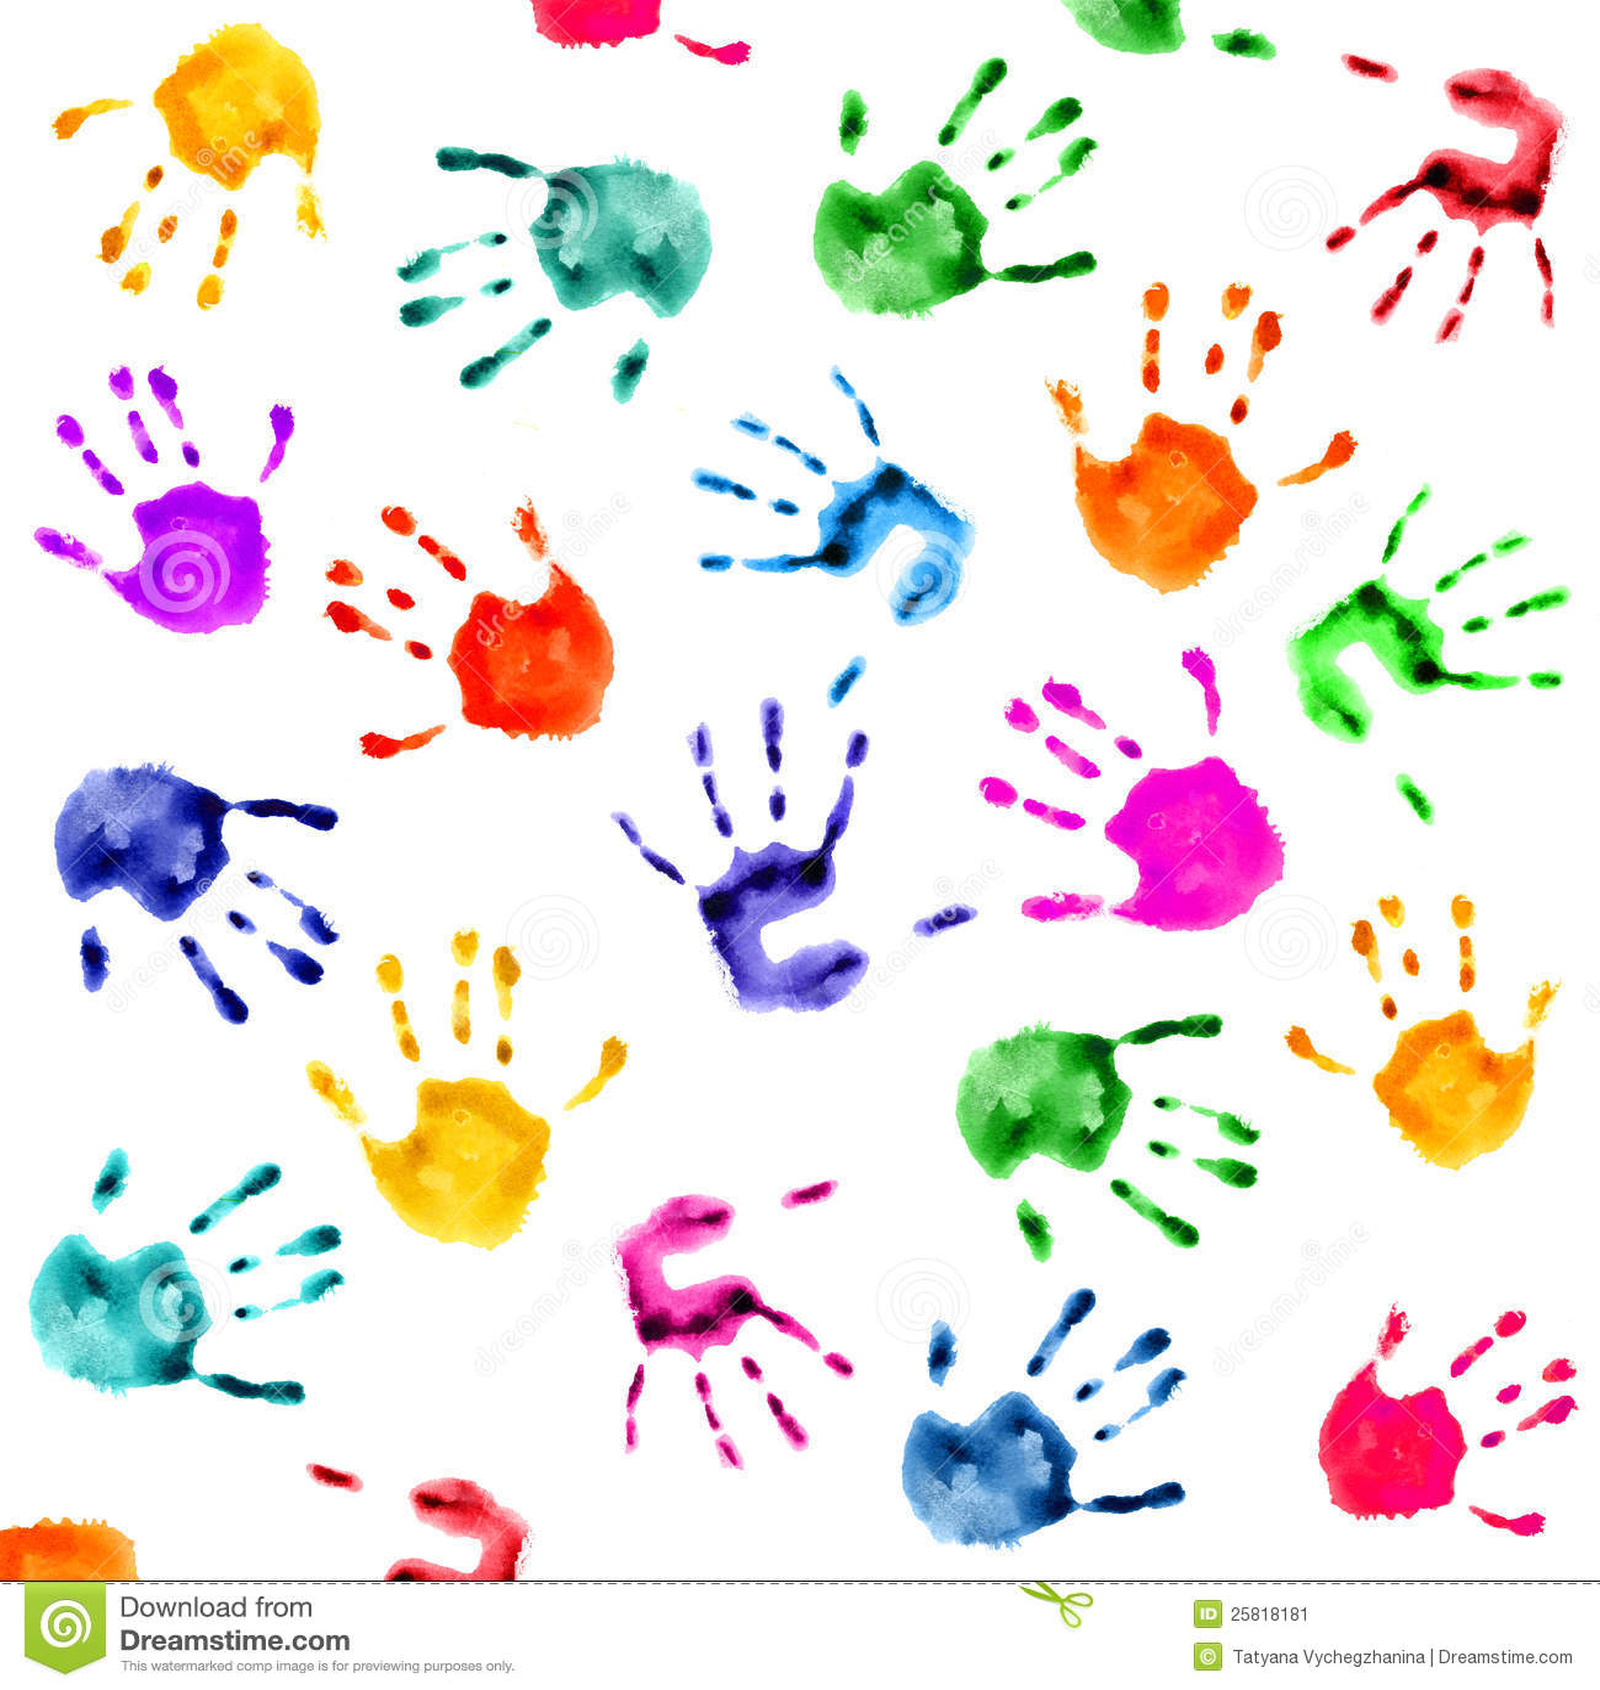 Hand Prints Background Stock Image - Image: 25818181